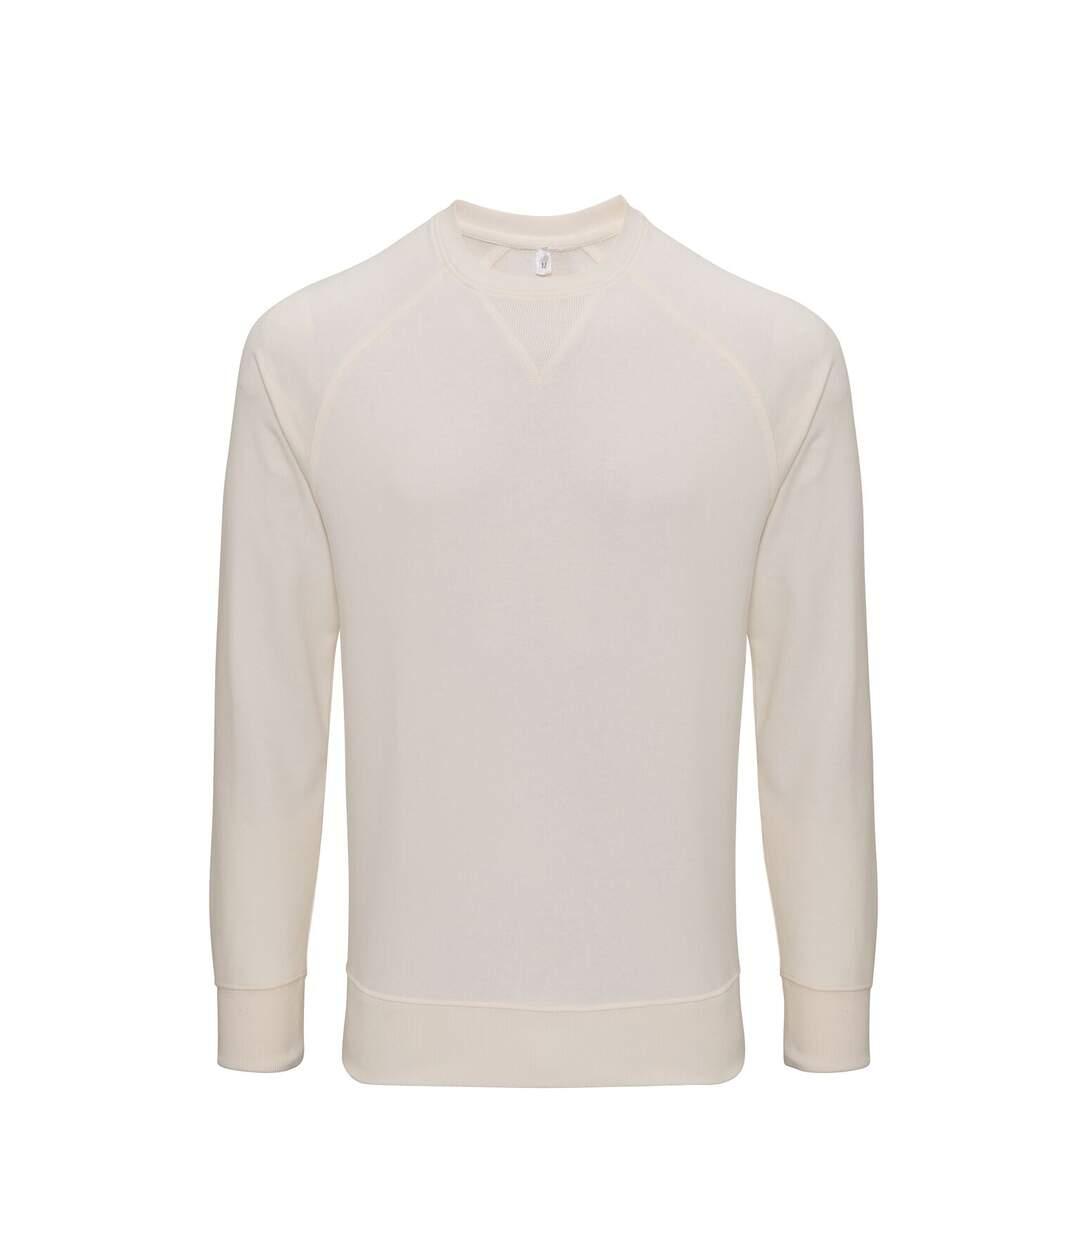 Asquith & Fox Mens Coastal Vintage Wash Loop Back Sweatshirt (Vintage White) - UTRW6240